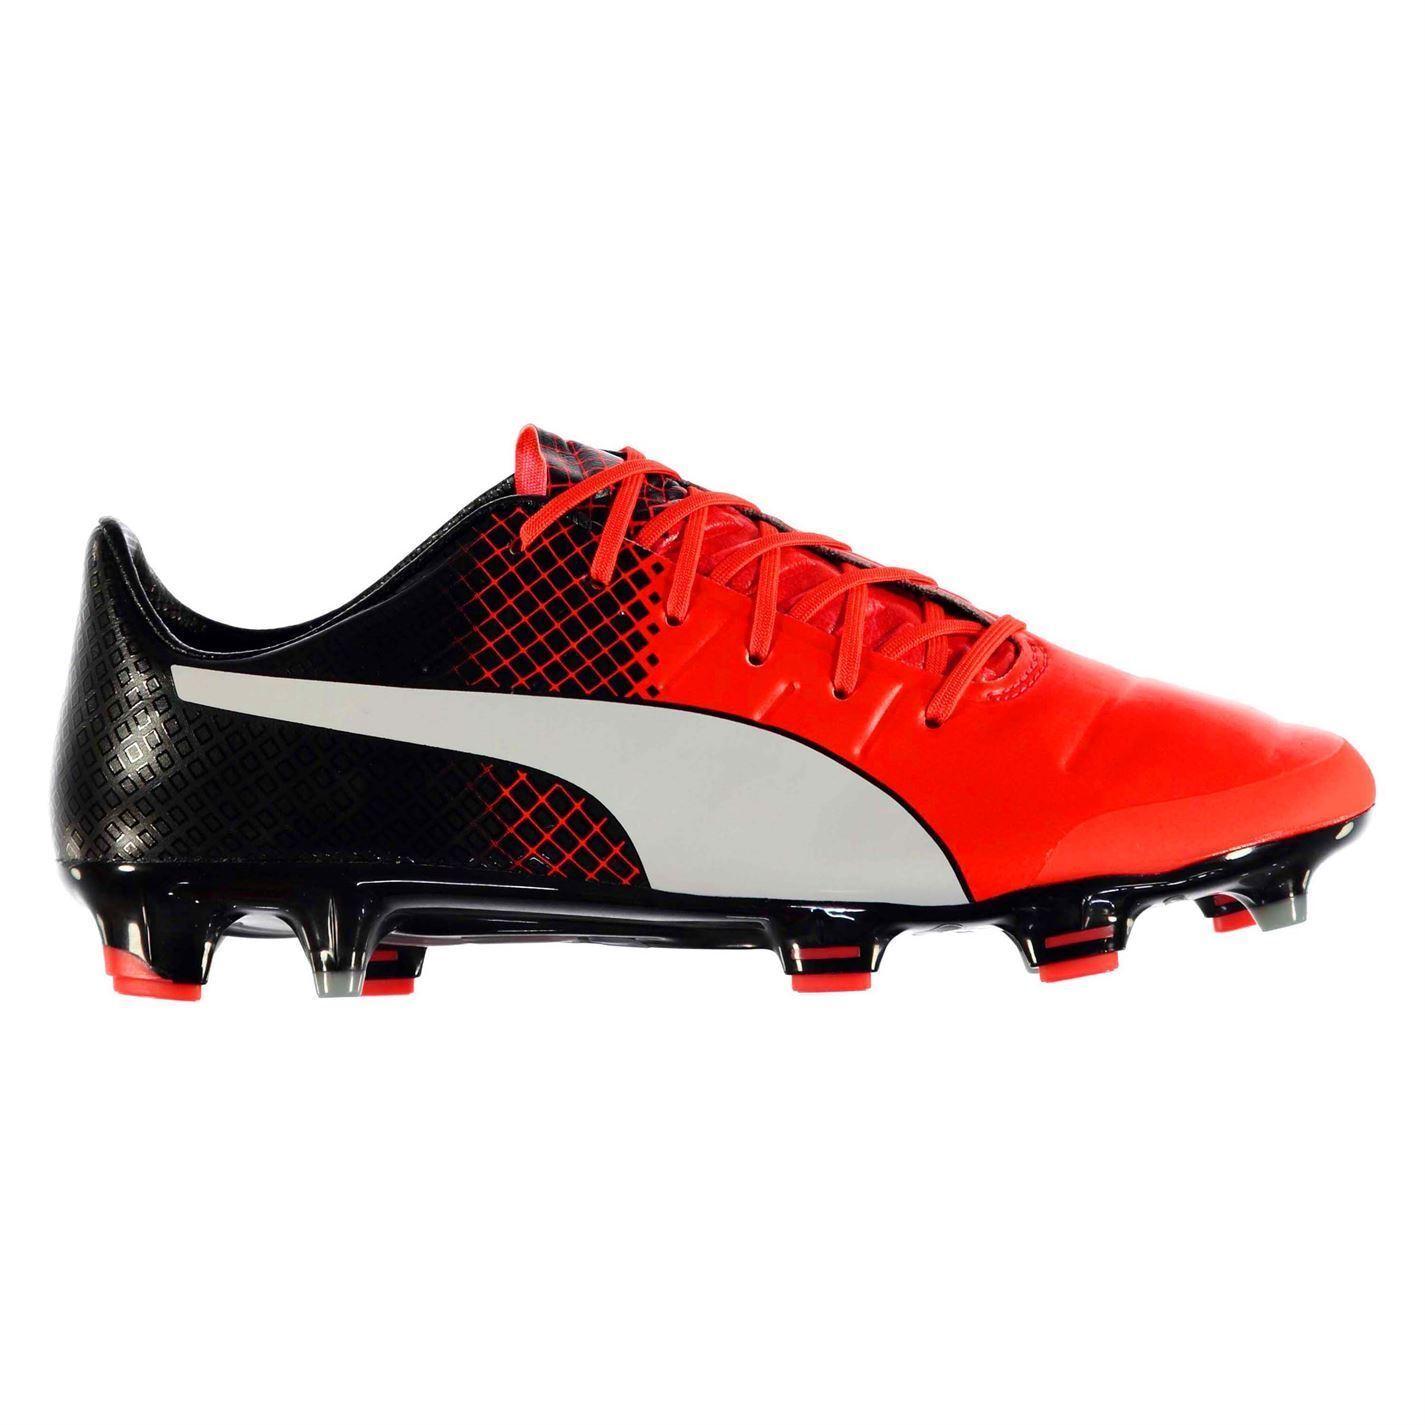 Puma EvoPower 1.3 FG Firm Ground Football Stiefel  Herren Rd/Blk Soccer Cleats Schuhes